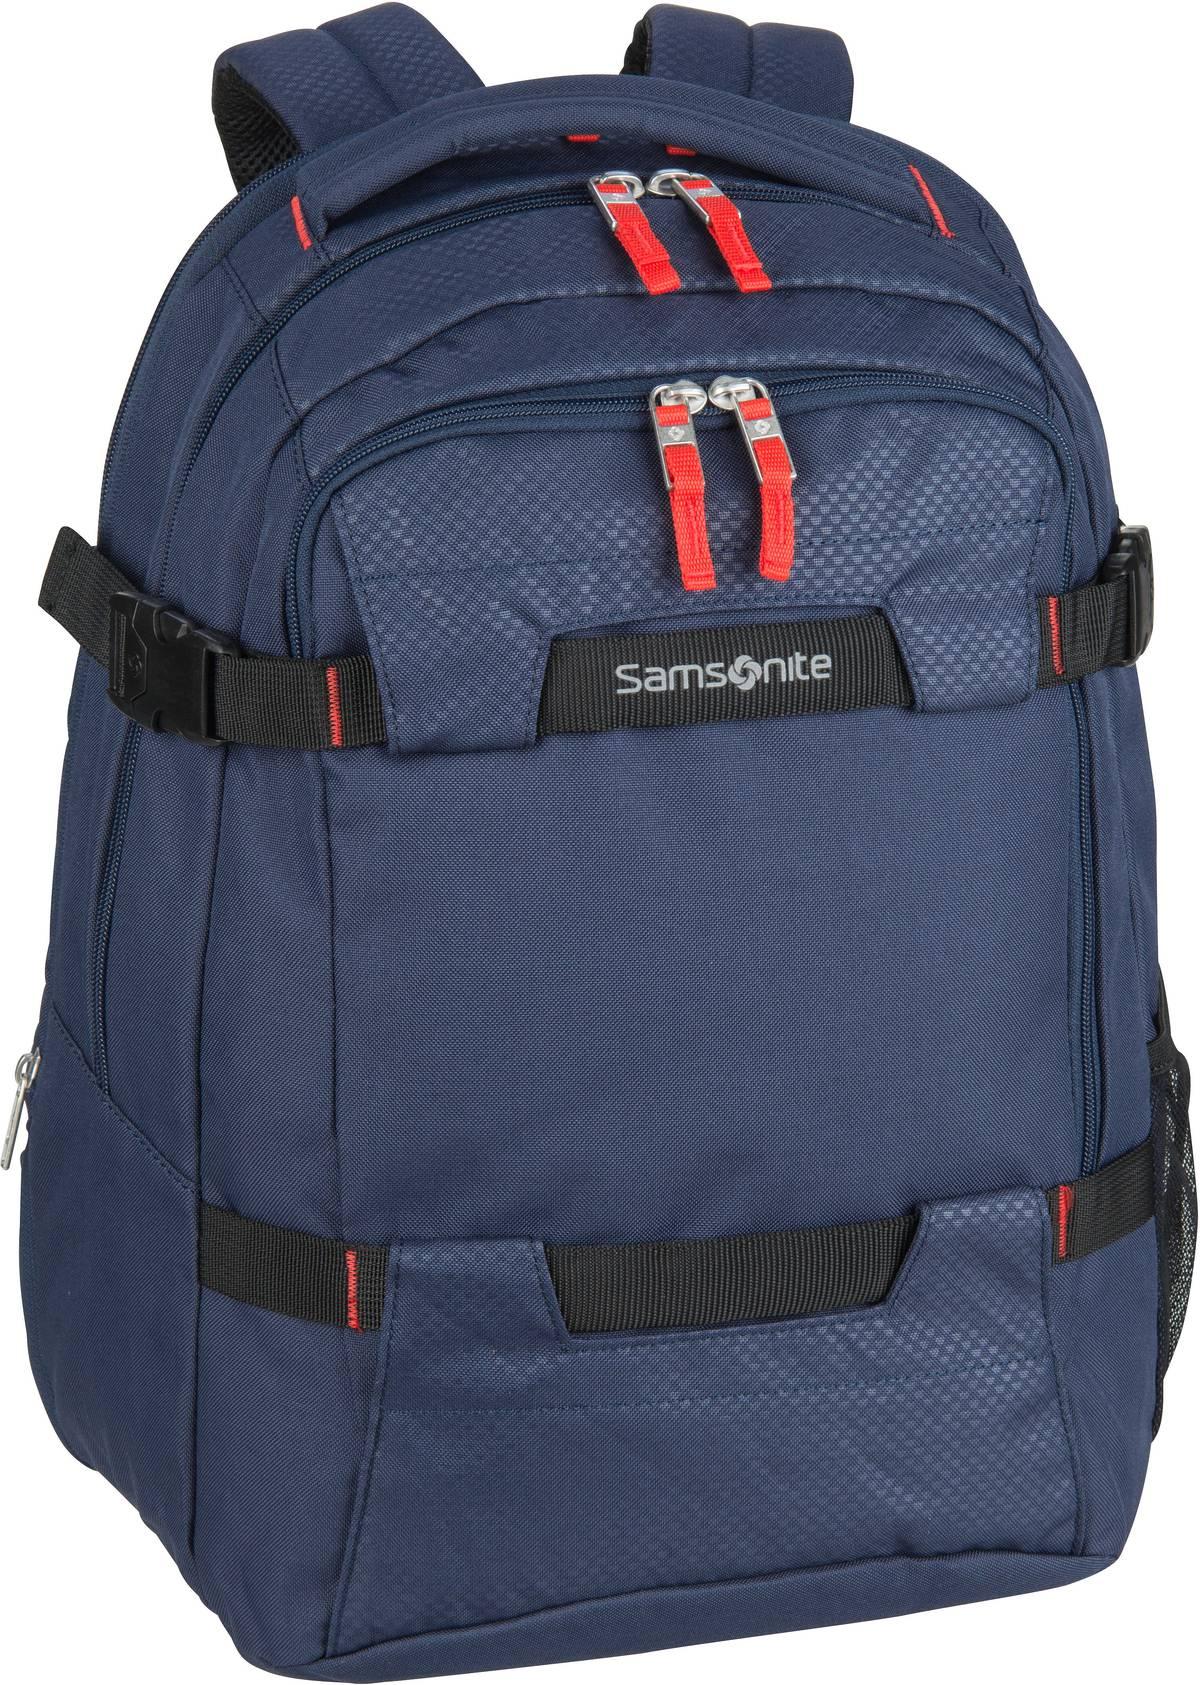 Rucksack / Daypack Sonora Laptop Backpack L exp Night Blue (31 Liter)